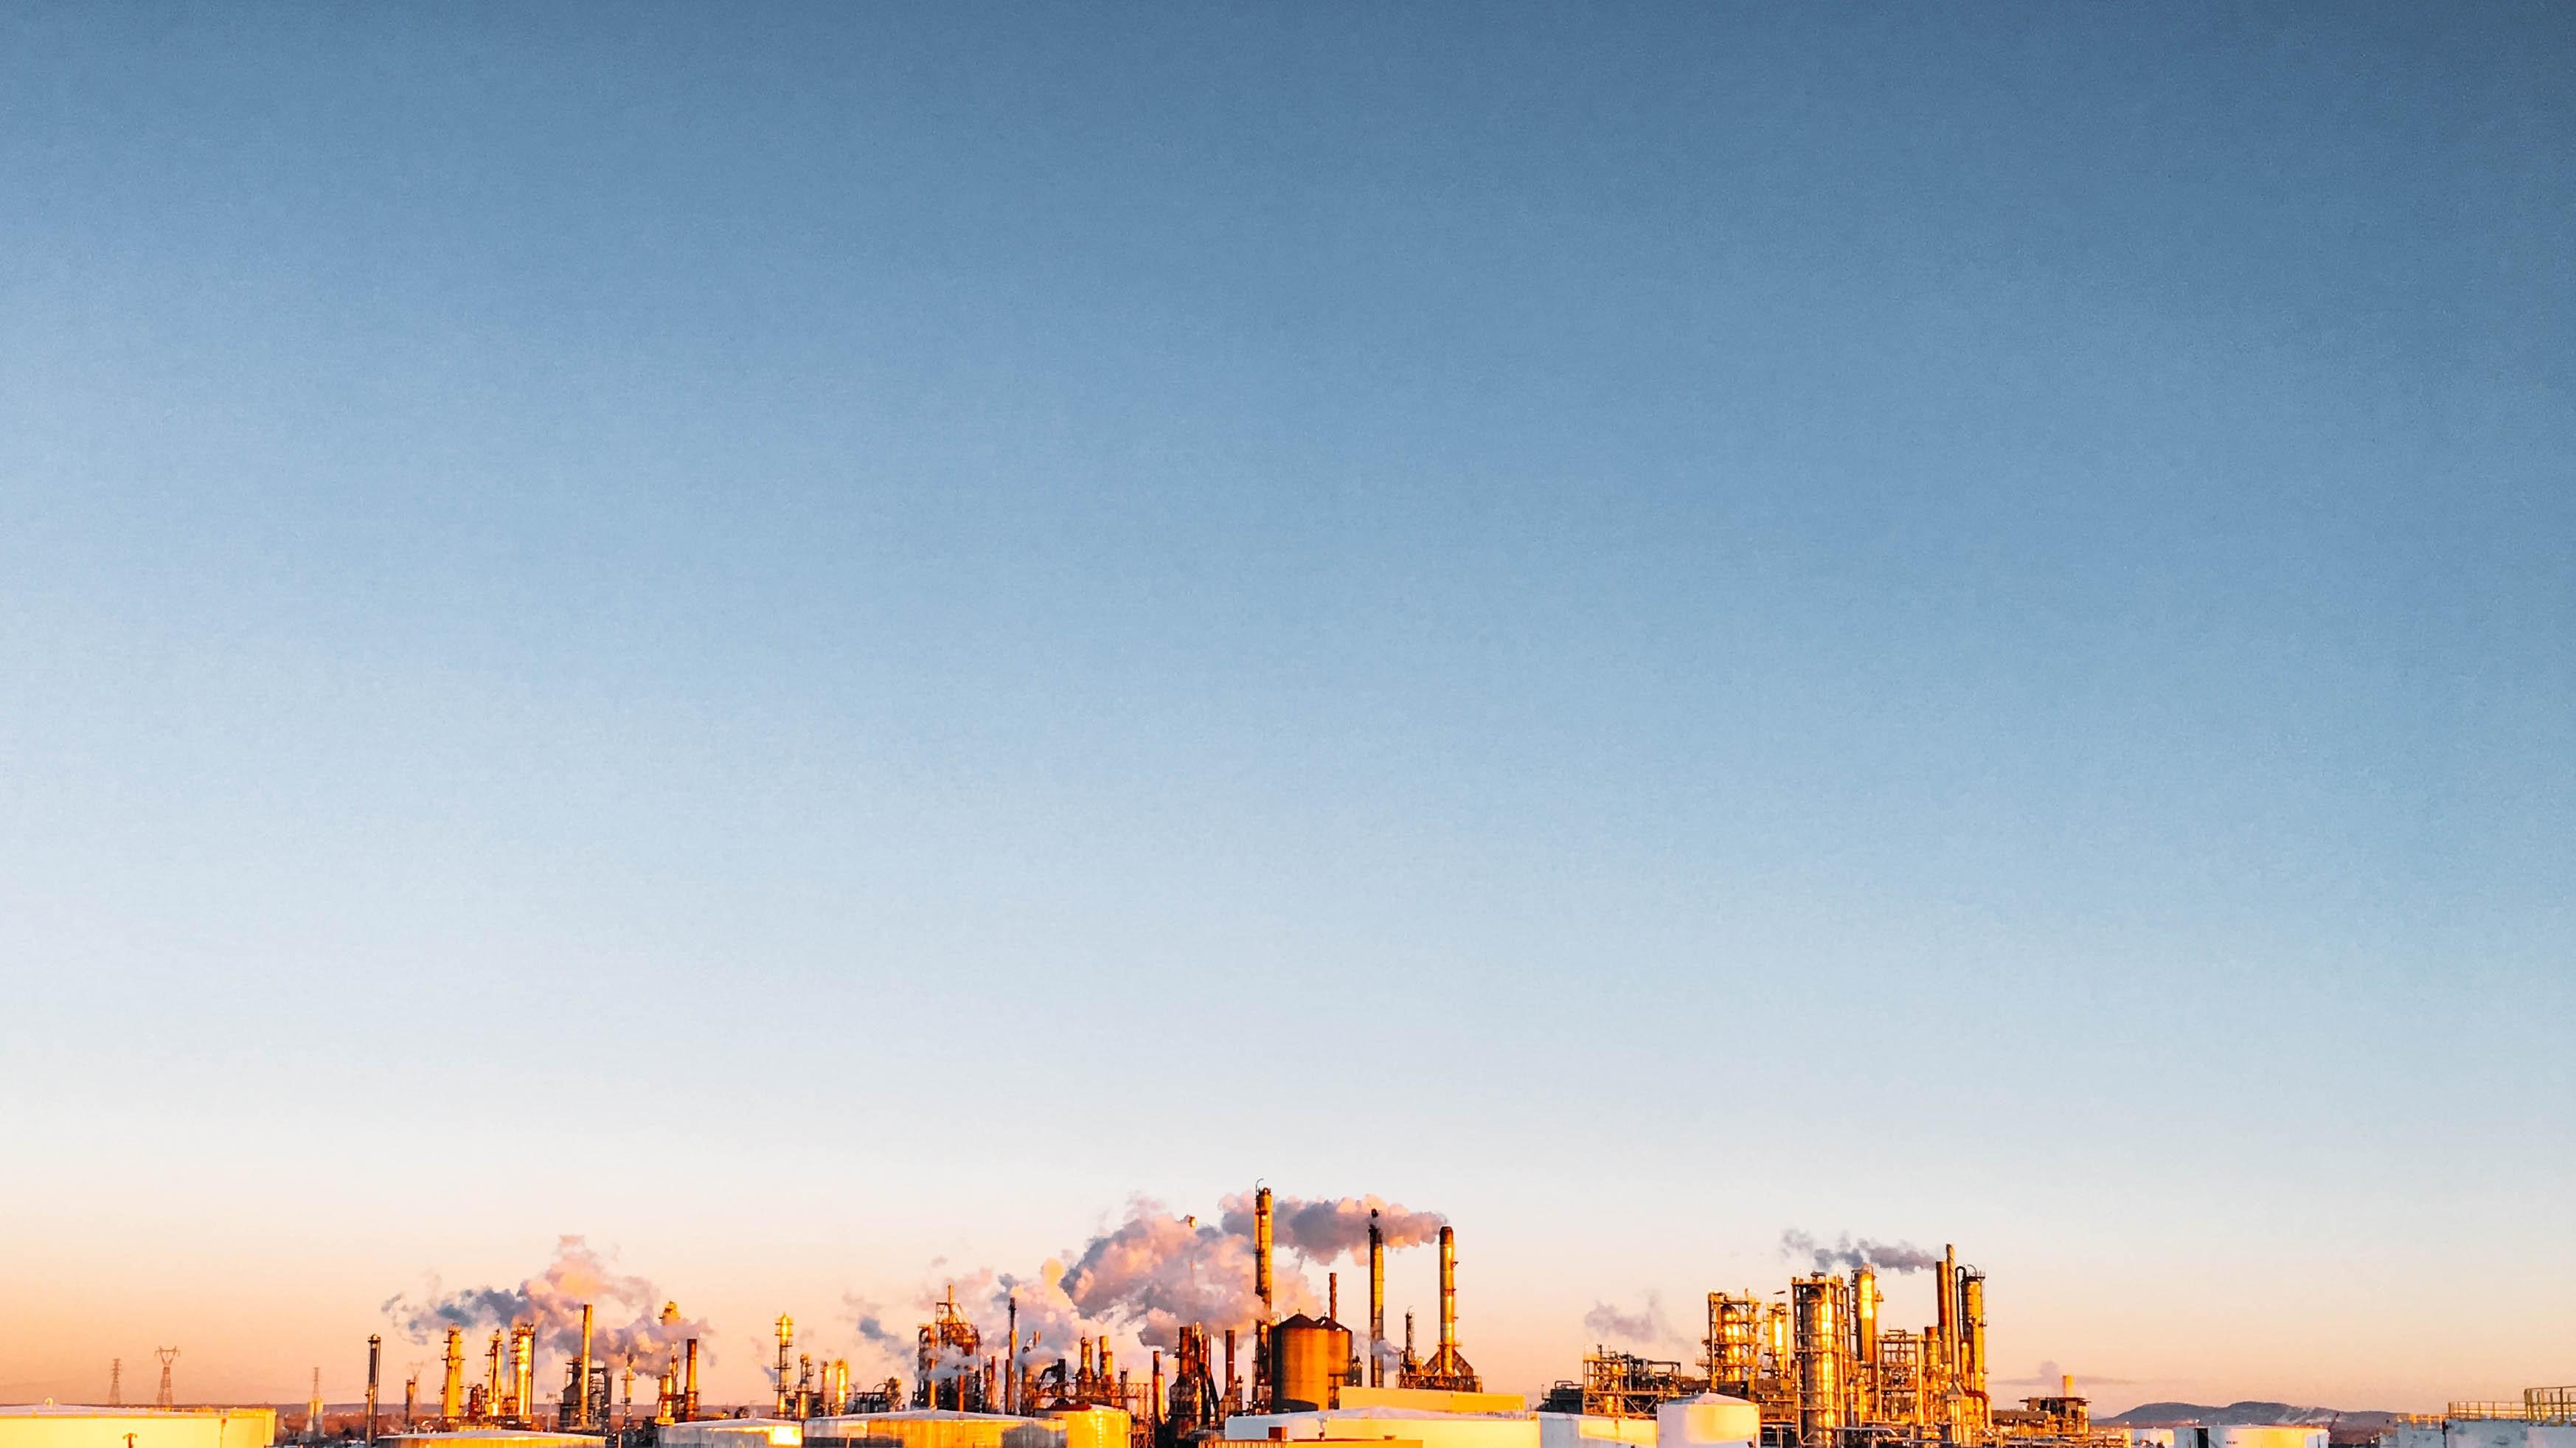 Explainer Episode 29 – The EPA's Methane Emissions Rule